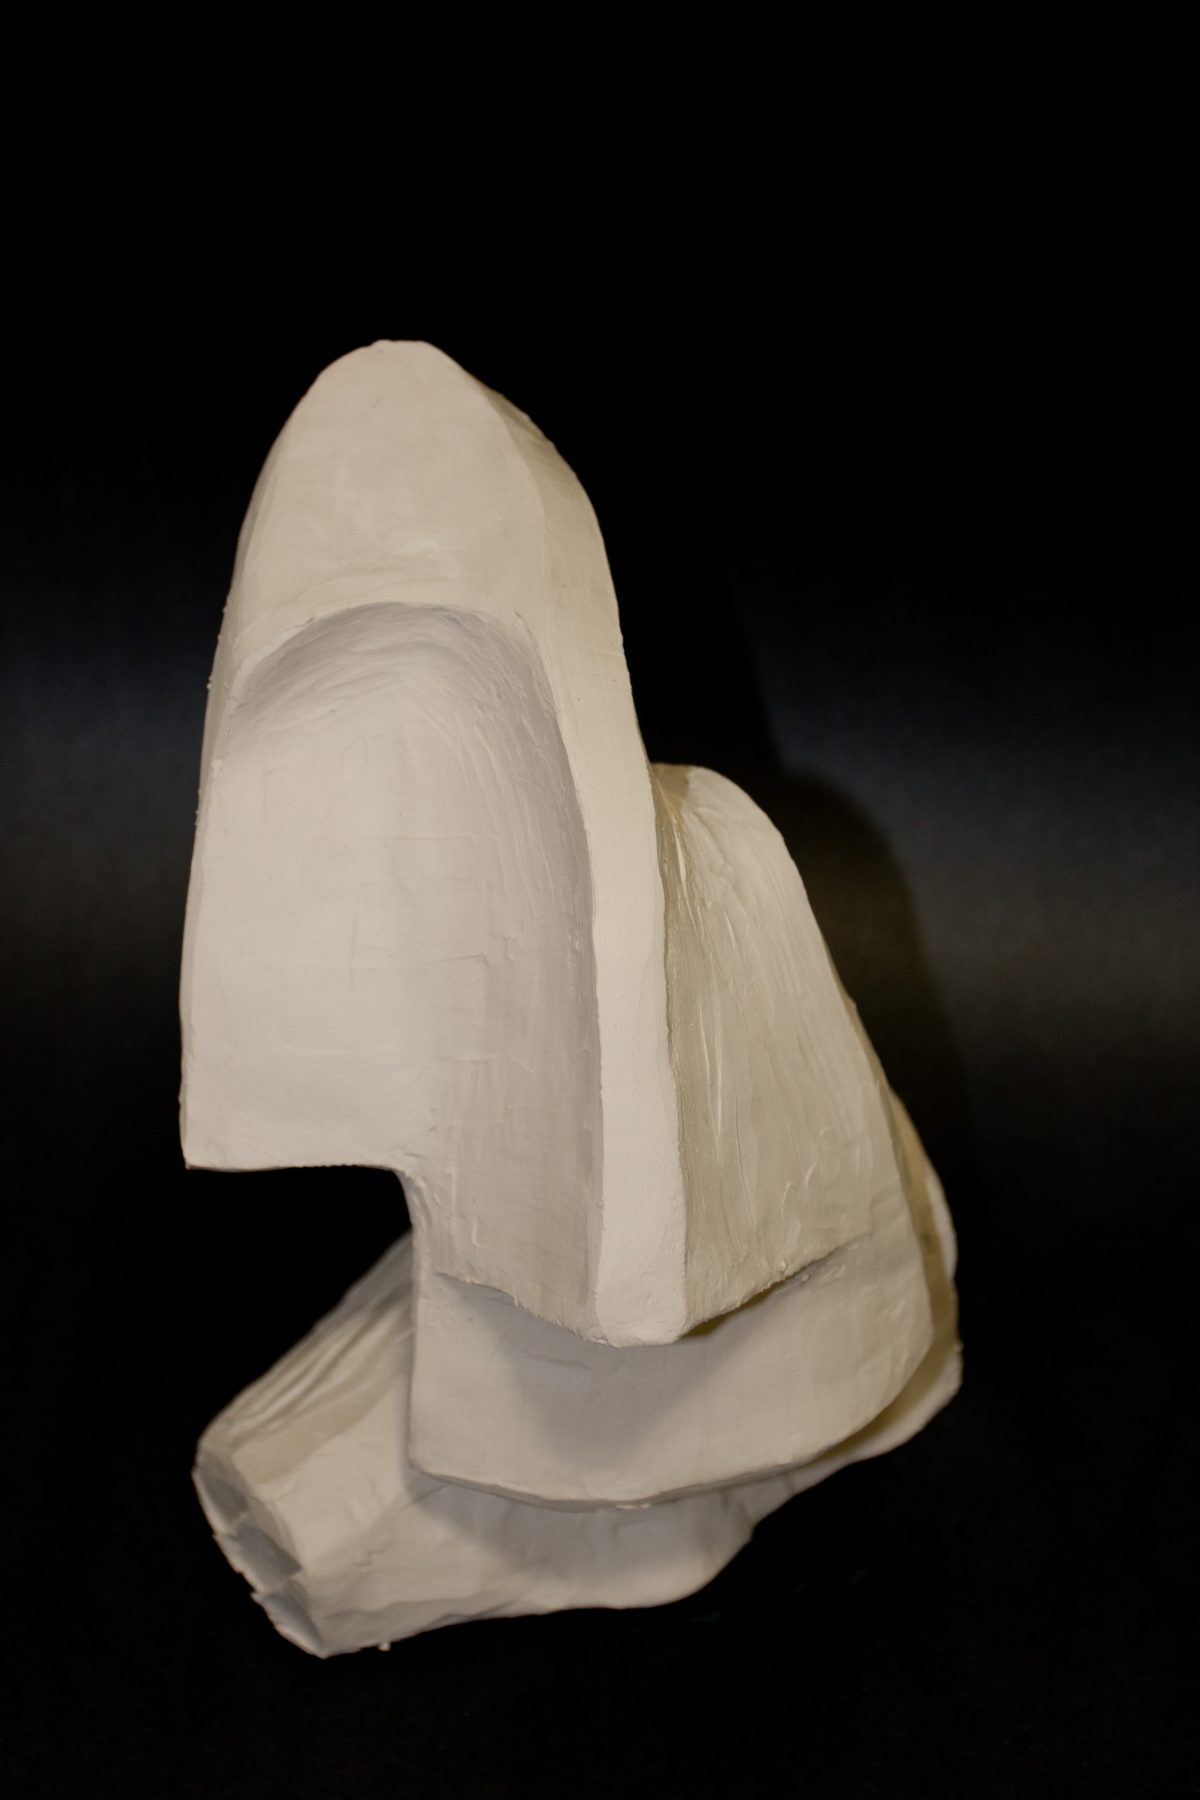 Twist face WIP - 20cm, clay, ch3, clay, bust